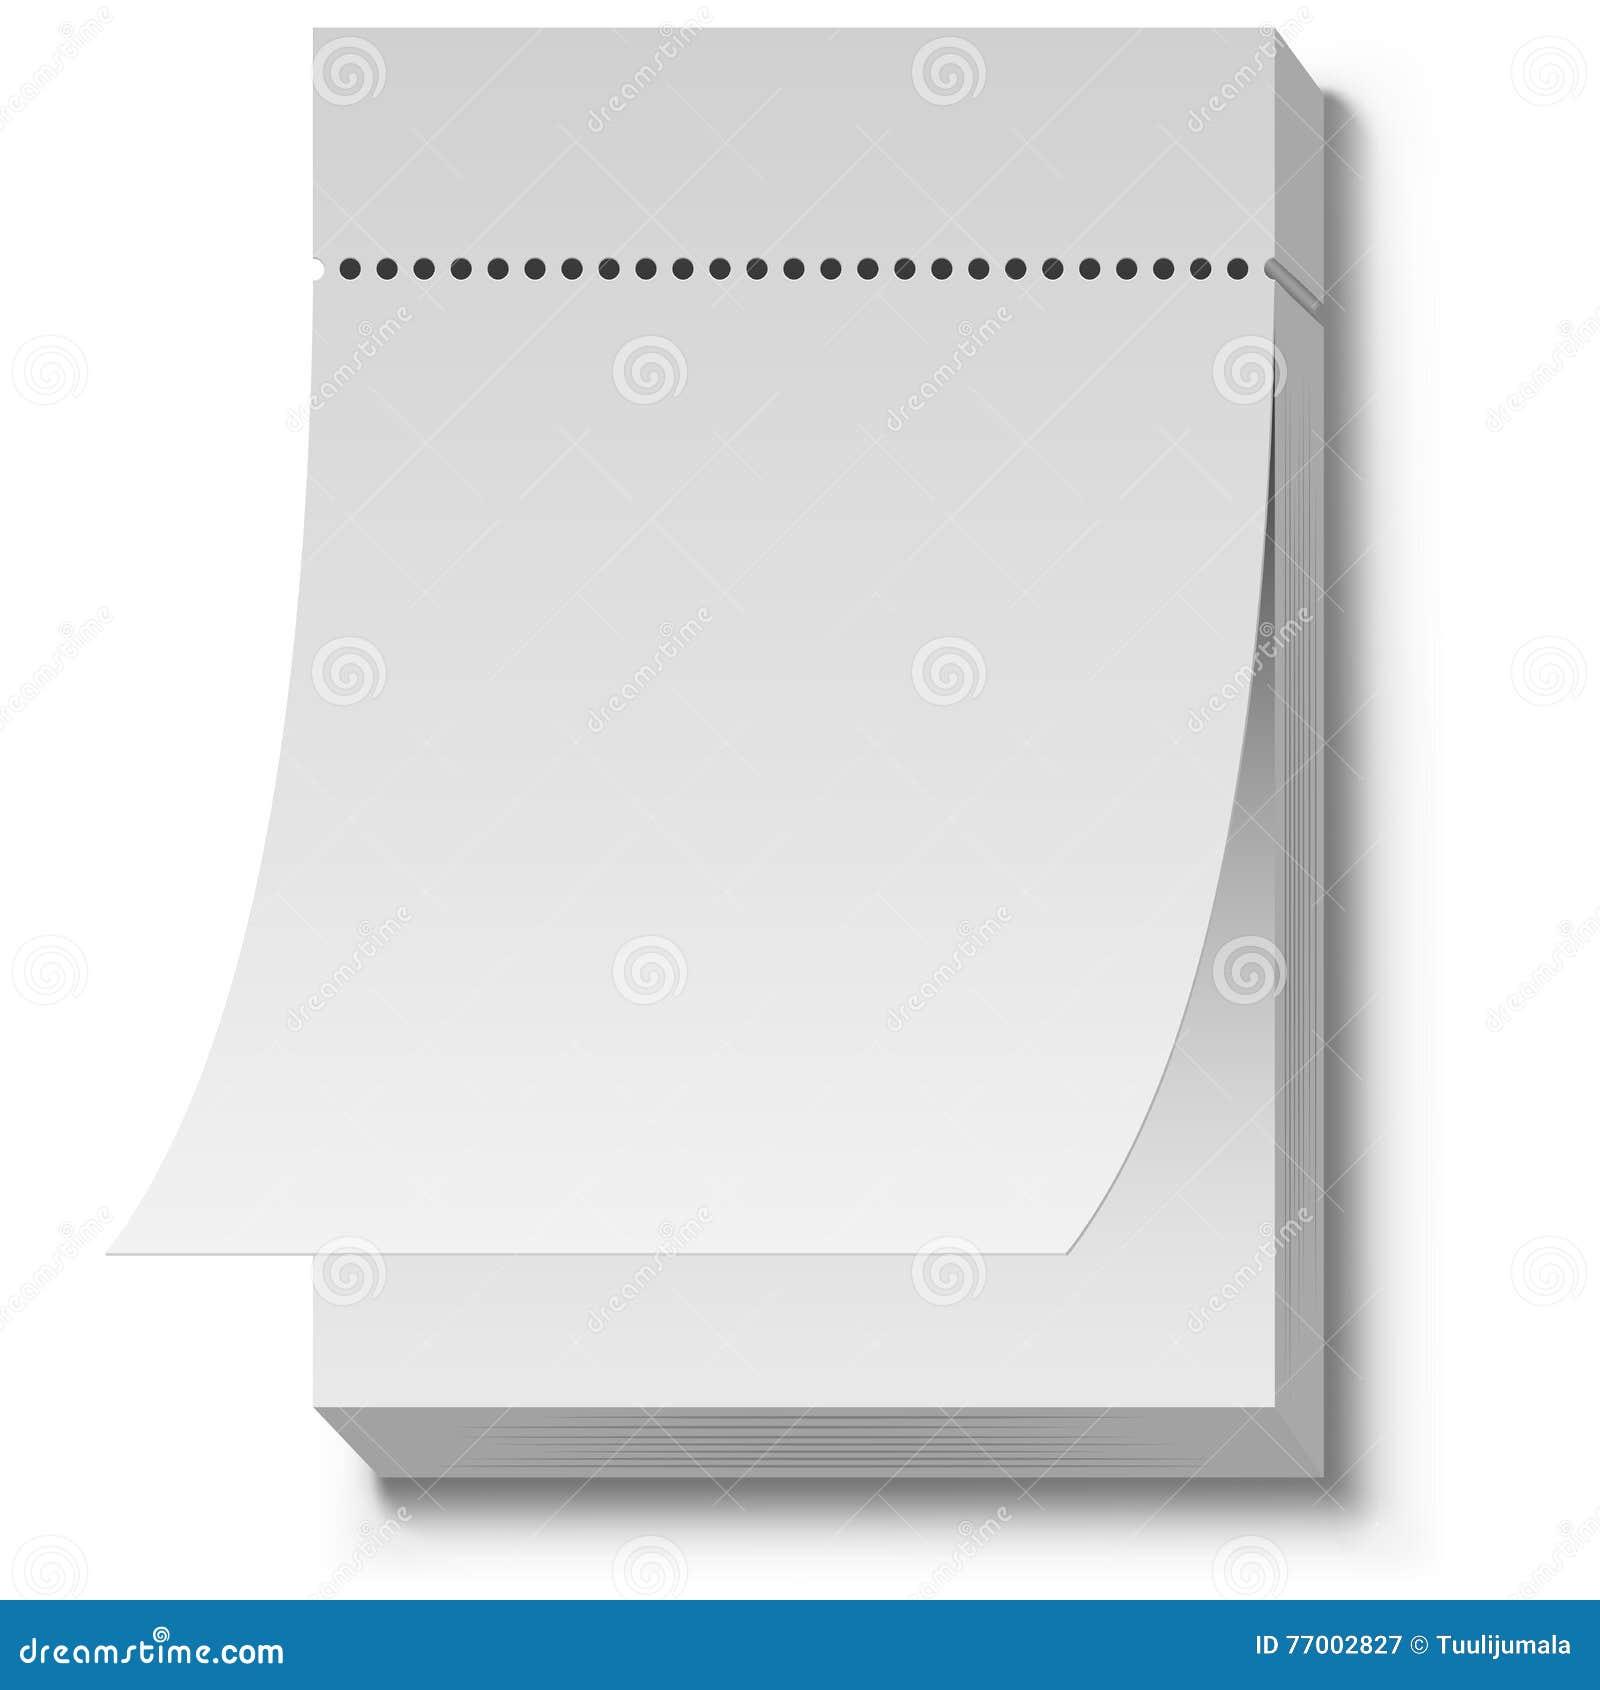 daily desktop calendar template for excel